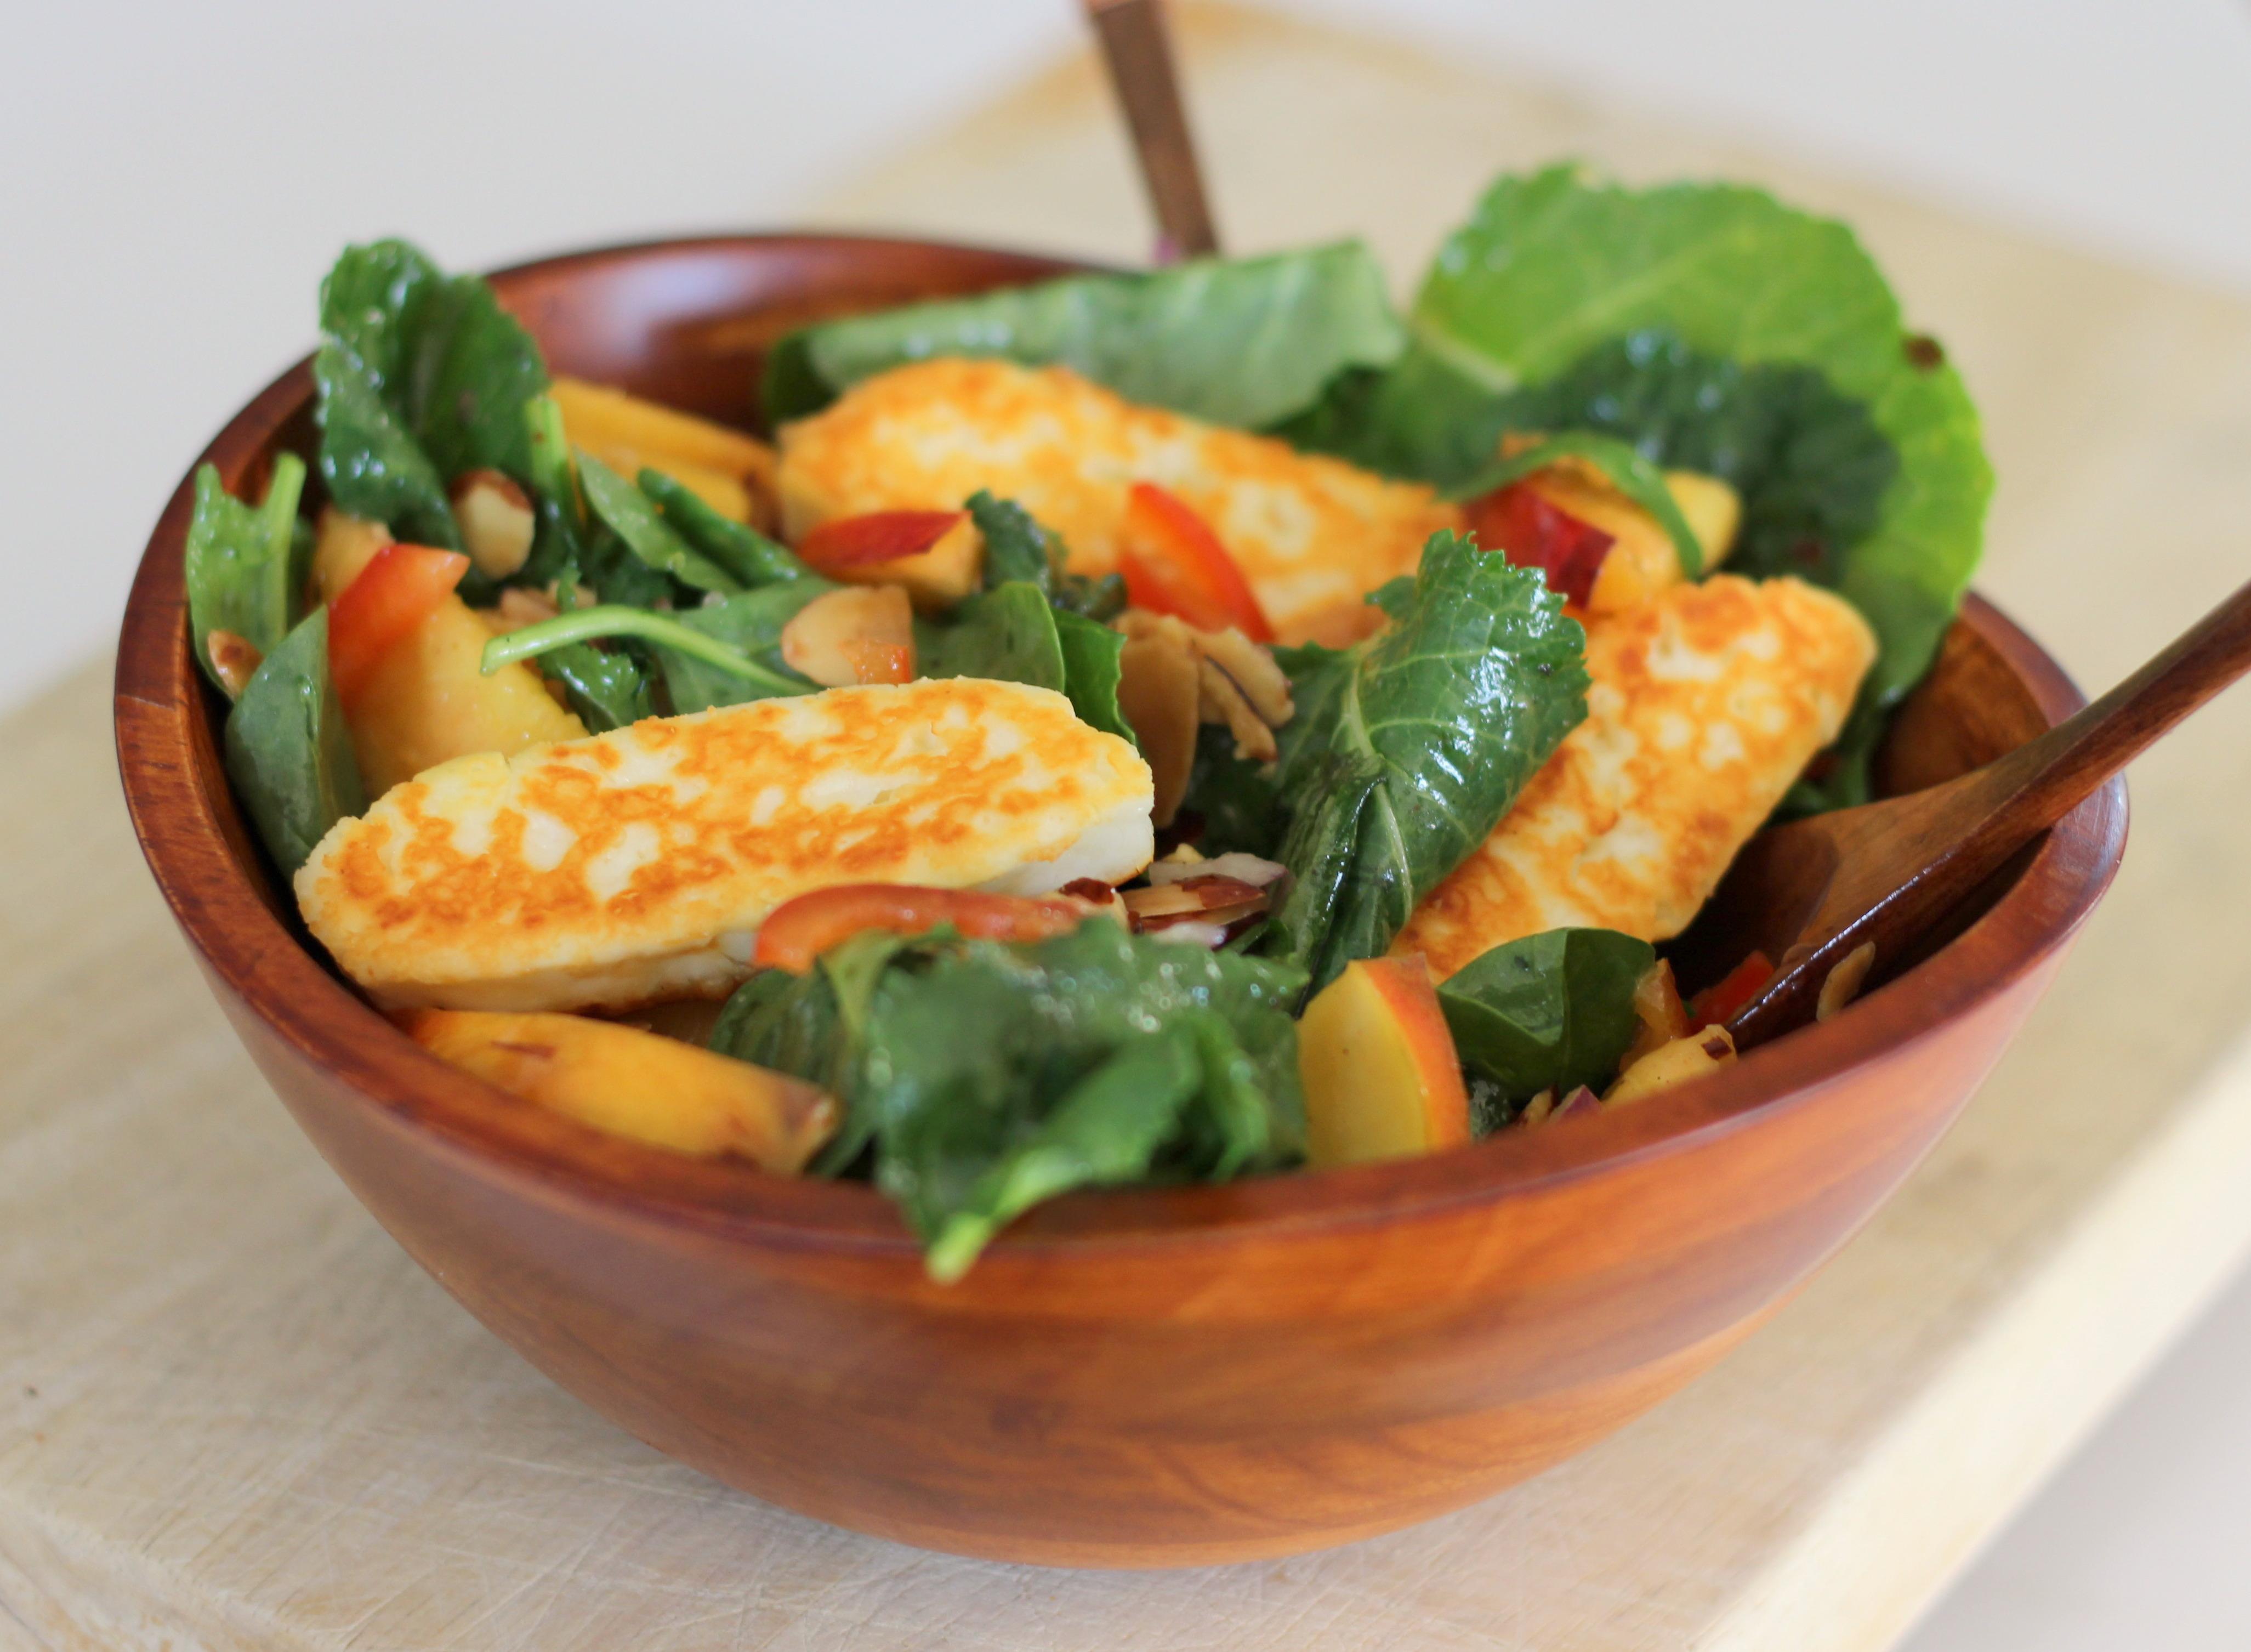 Spinach, Nectarine, and Halloumi Salad